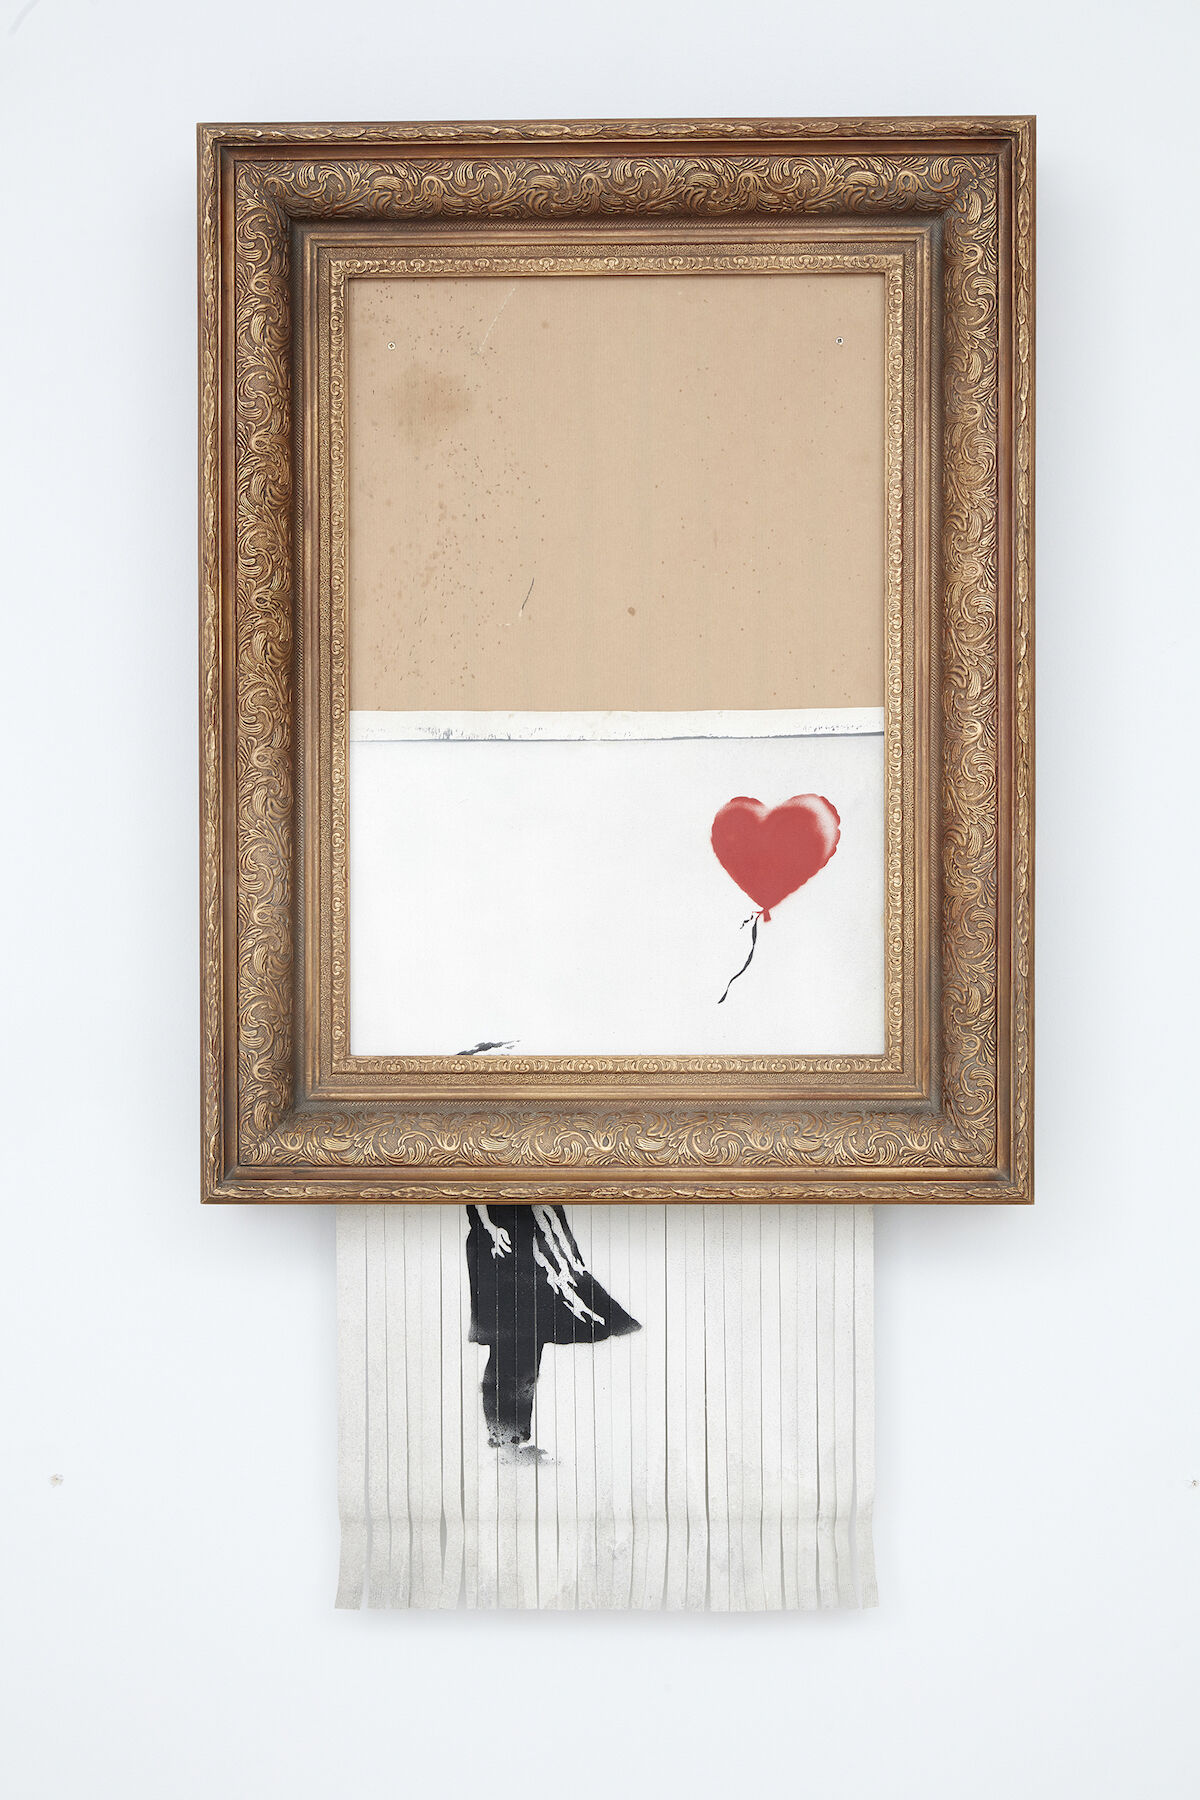 Banksy, Love is in the Bin, 2018. Courtesy Sotheby's.